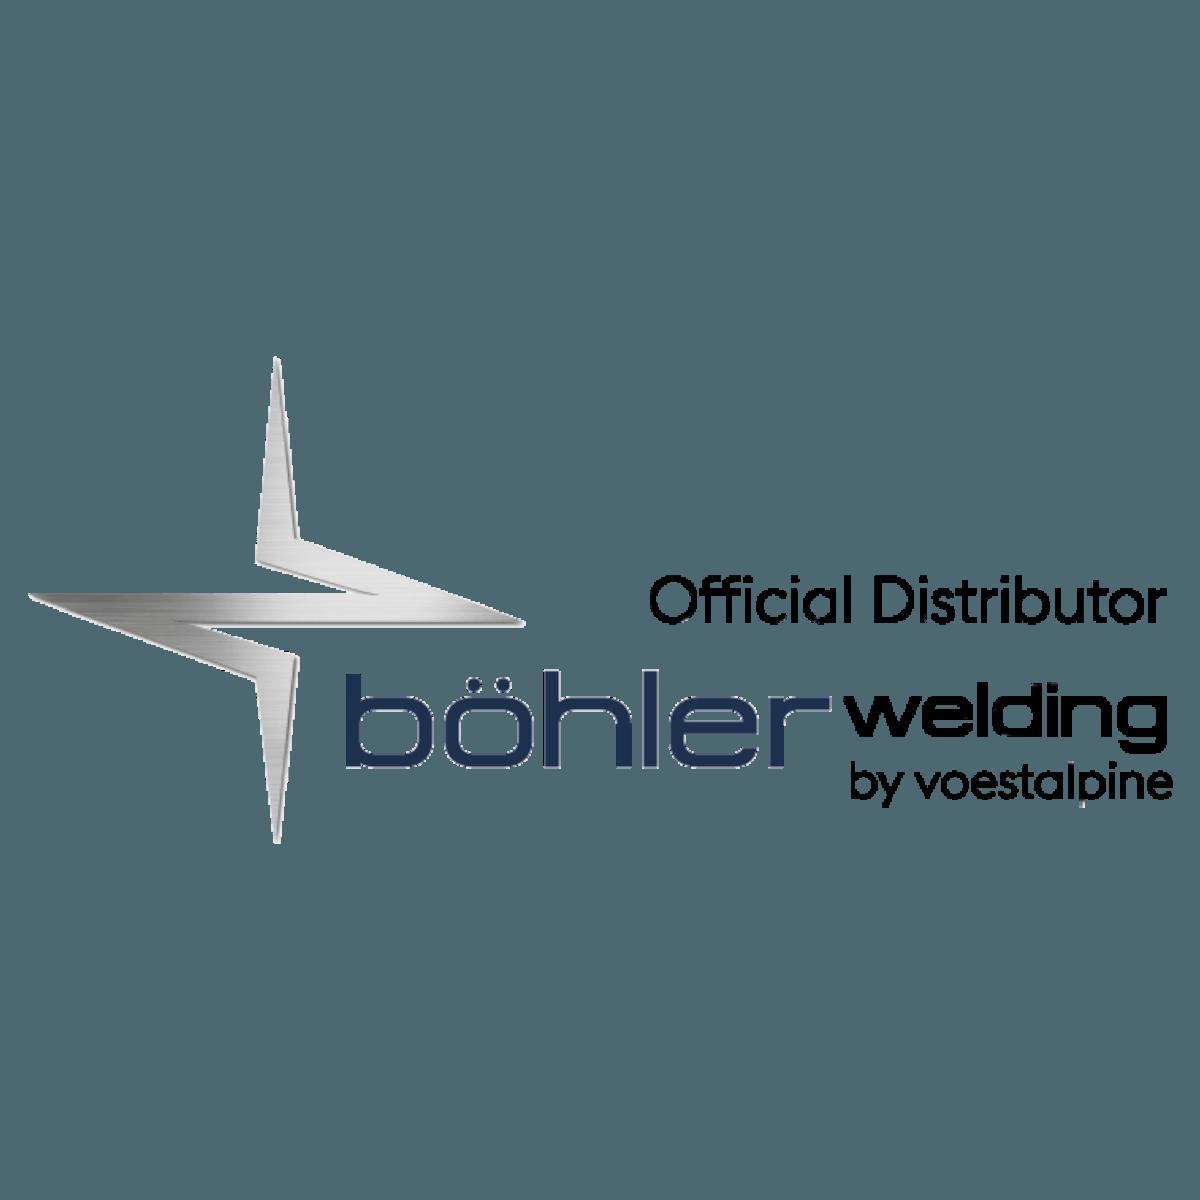 VOESTALPINE BOHLER WELDING